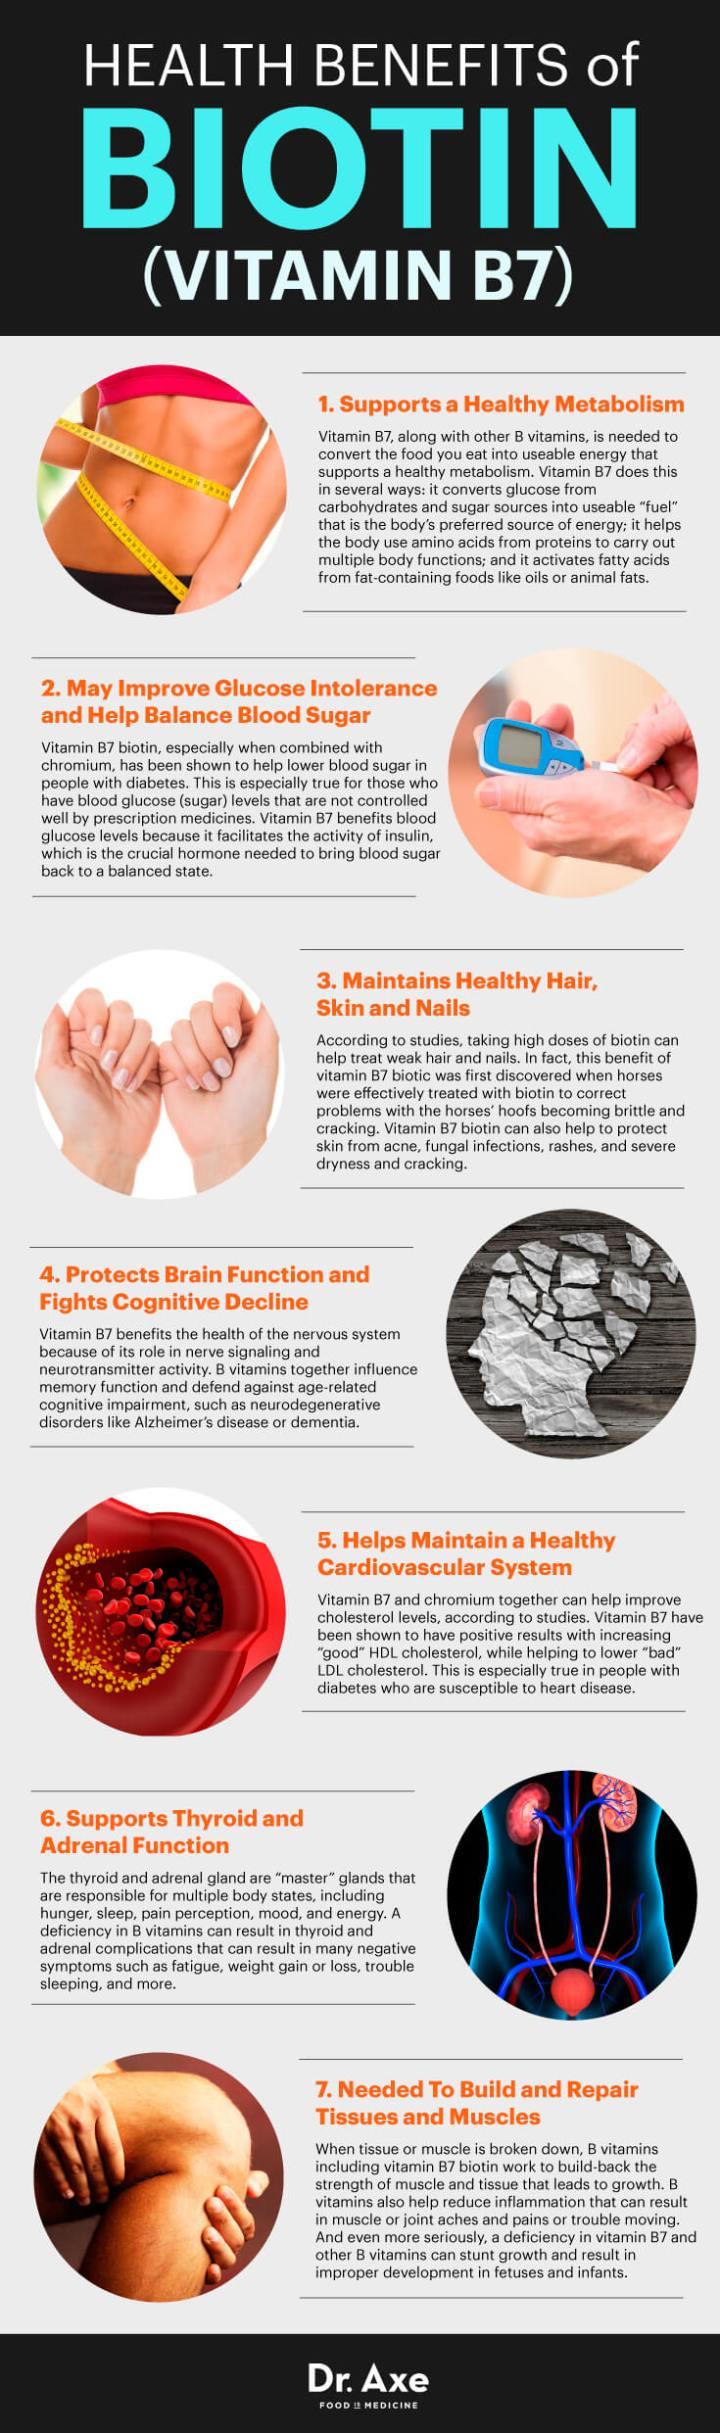 Biotin benefits